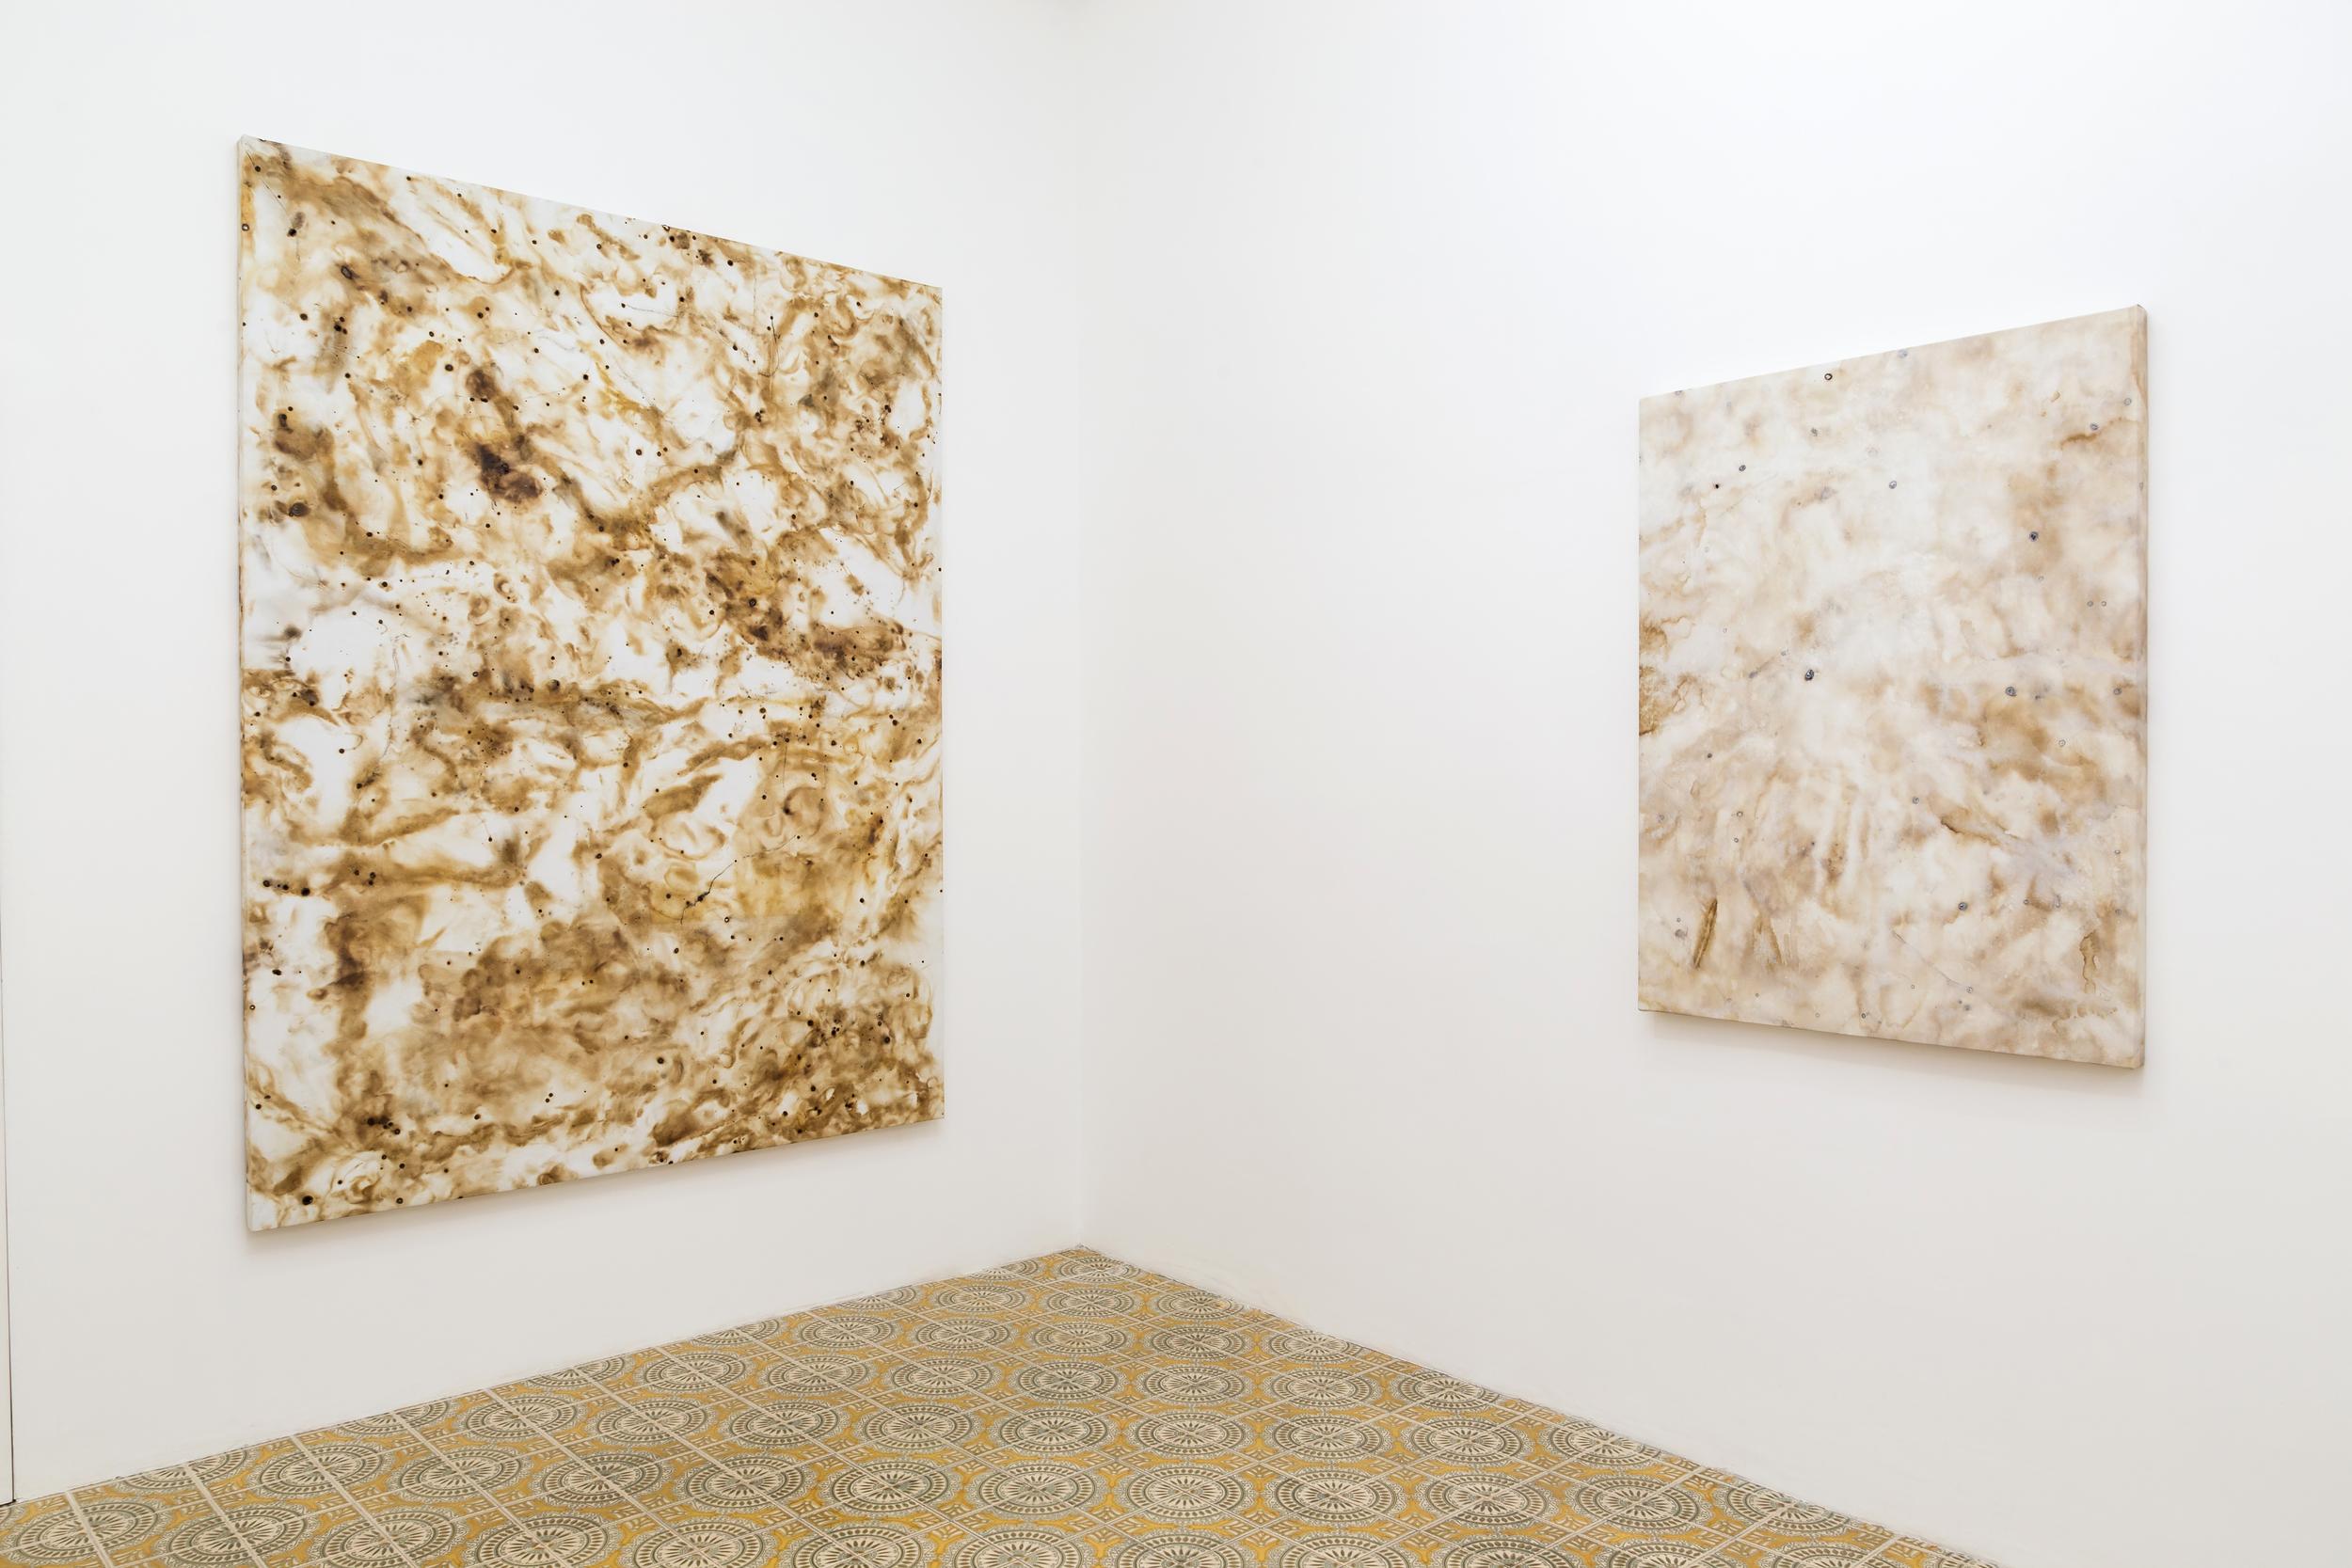 Flare Painting #91 (Sulle Gradinate, Scoppia L'Inferno), & Flare Painting #97 (Sulle Gradinate, Scoppia L'Inferno), 2015  Installation shot for Domenica at Galleria Acappella. Naples, Italy